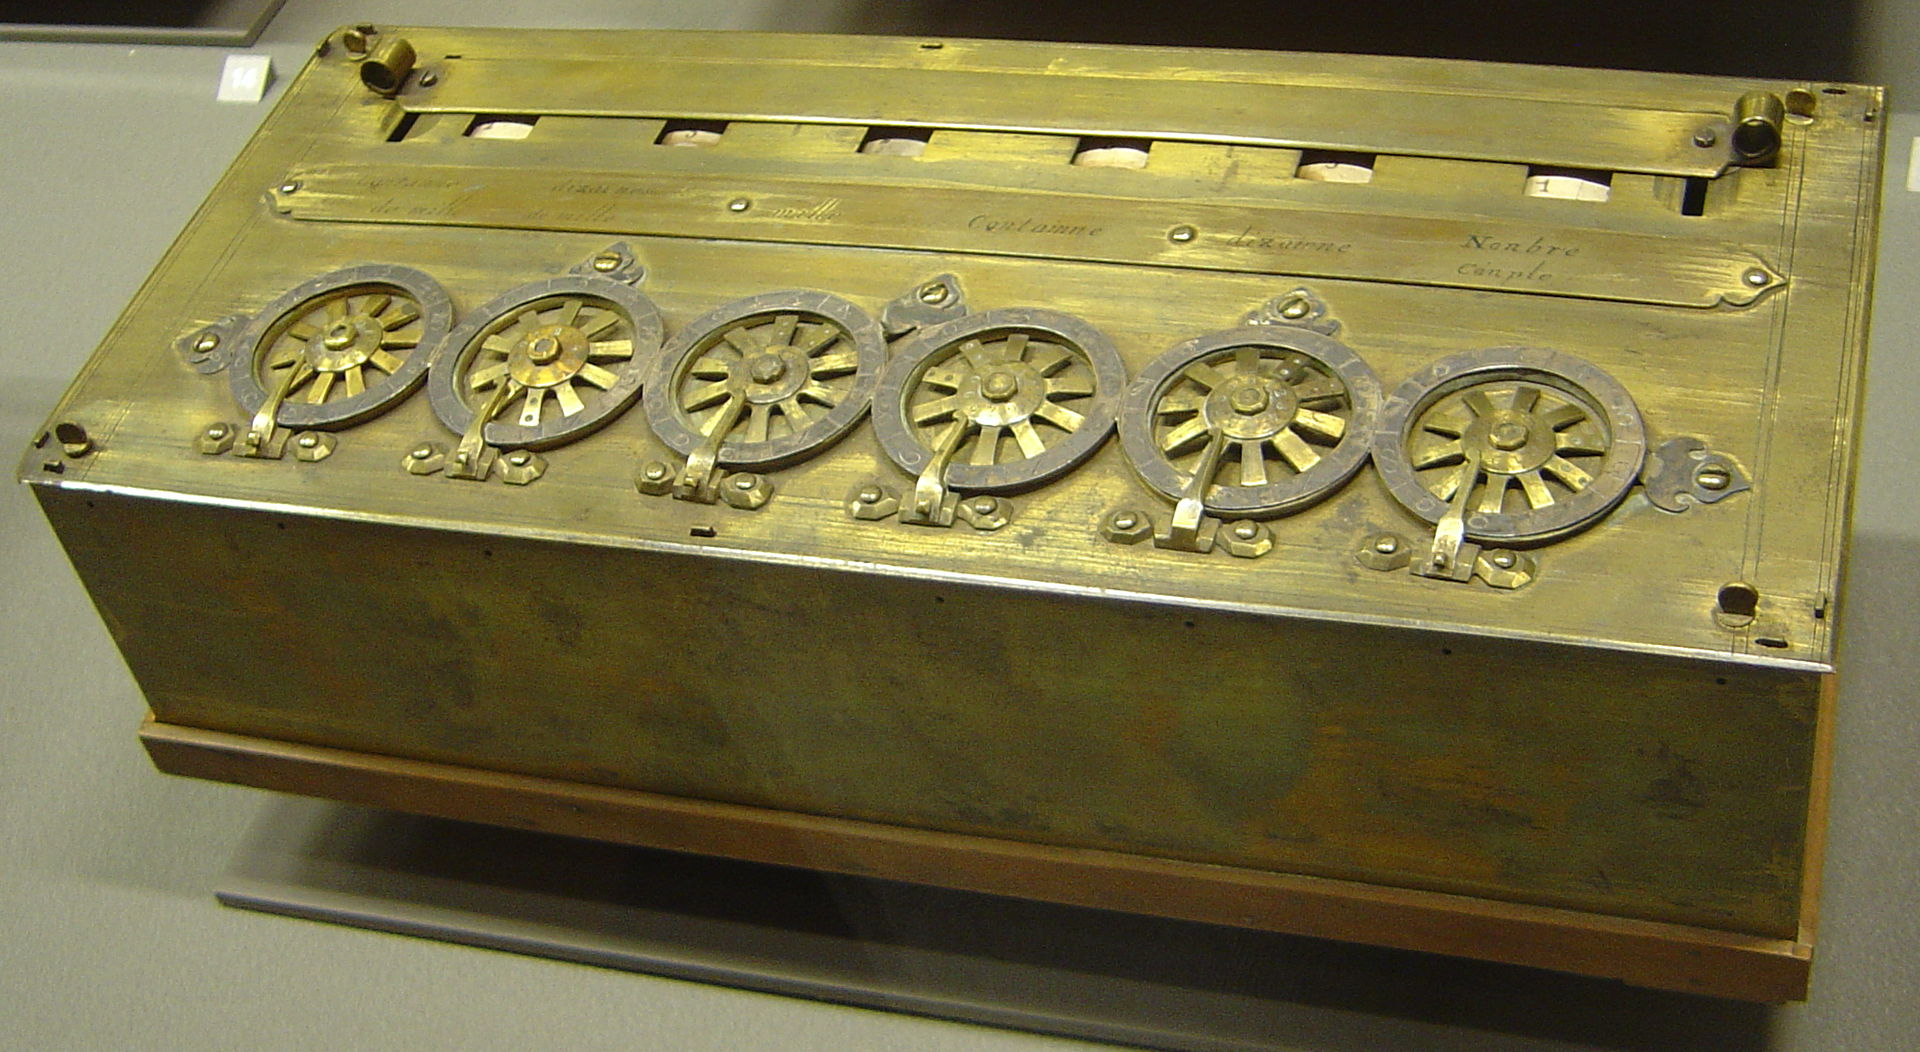 La Pascalina, una calculadora mecánica creada por Pascal, a base de ruedas y engranajes. Inicialmente, la llamó máquina aritmética.